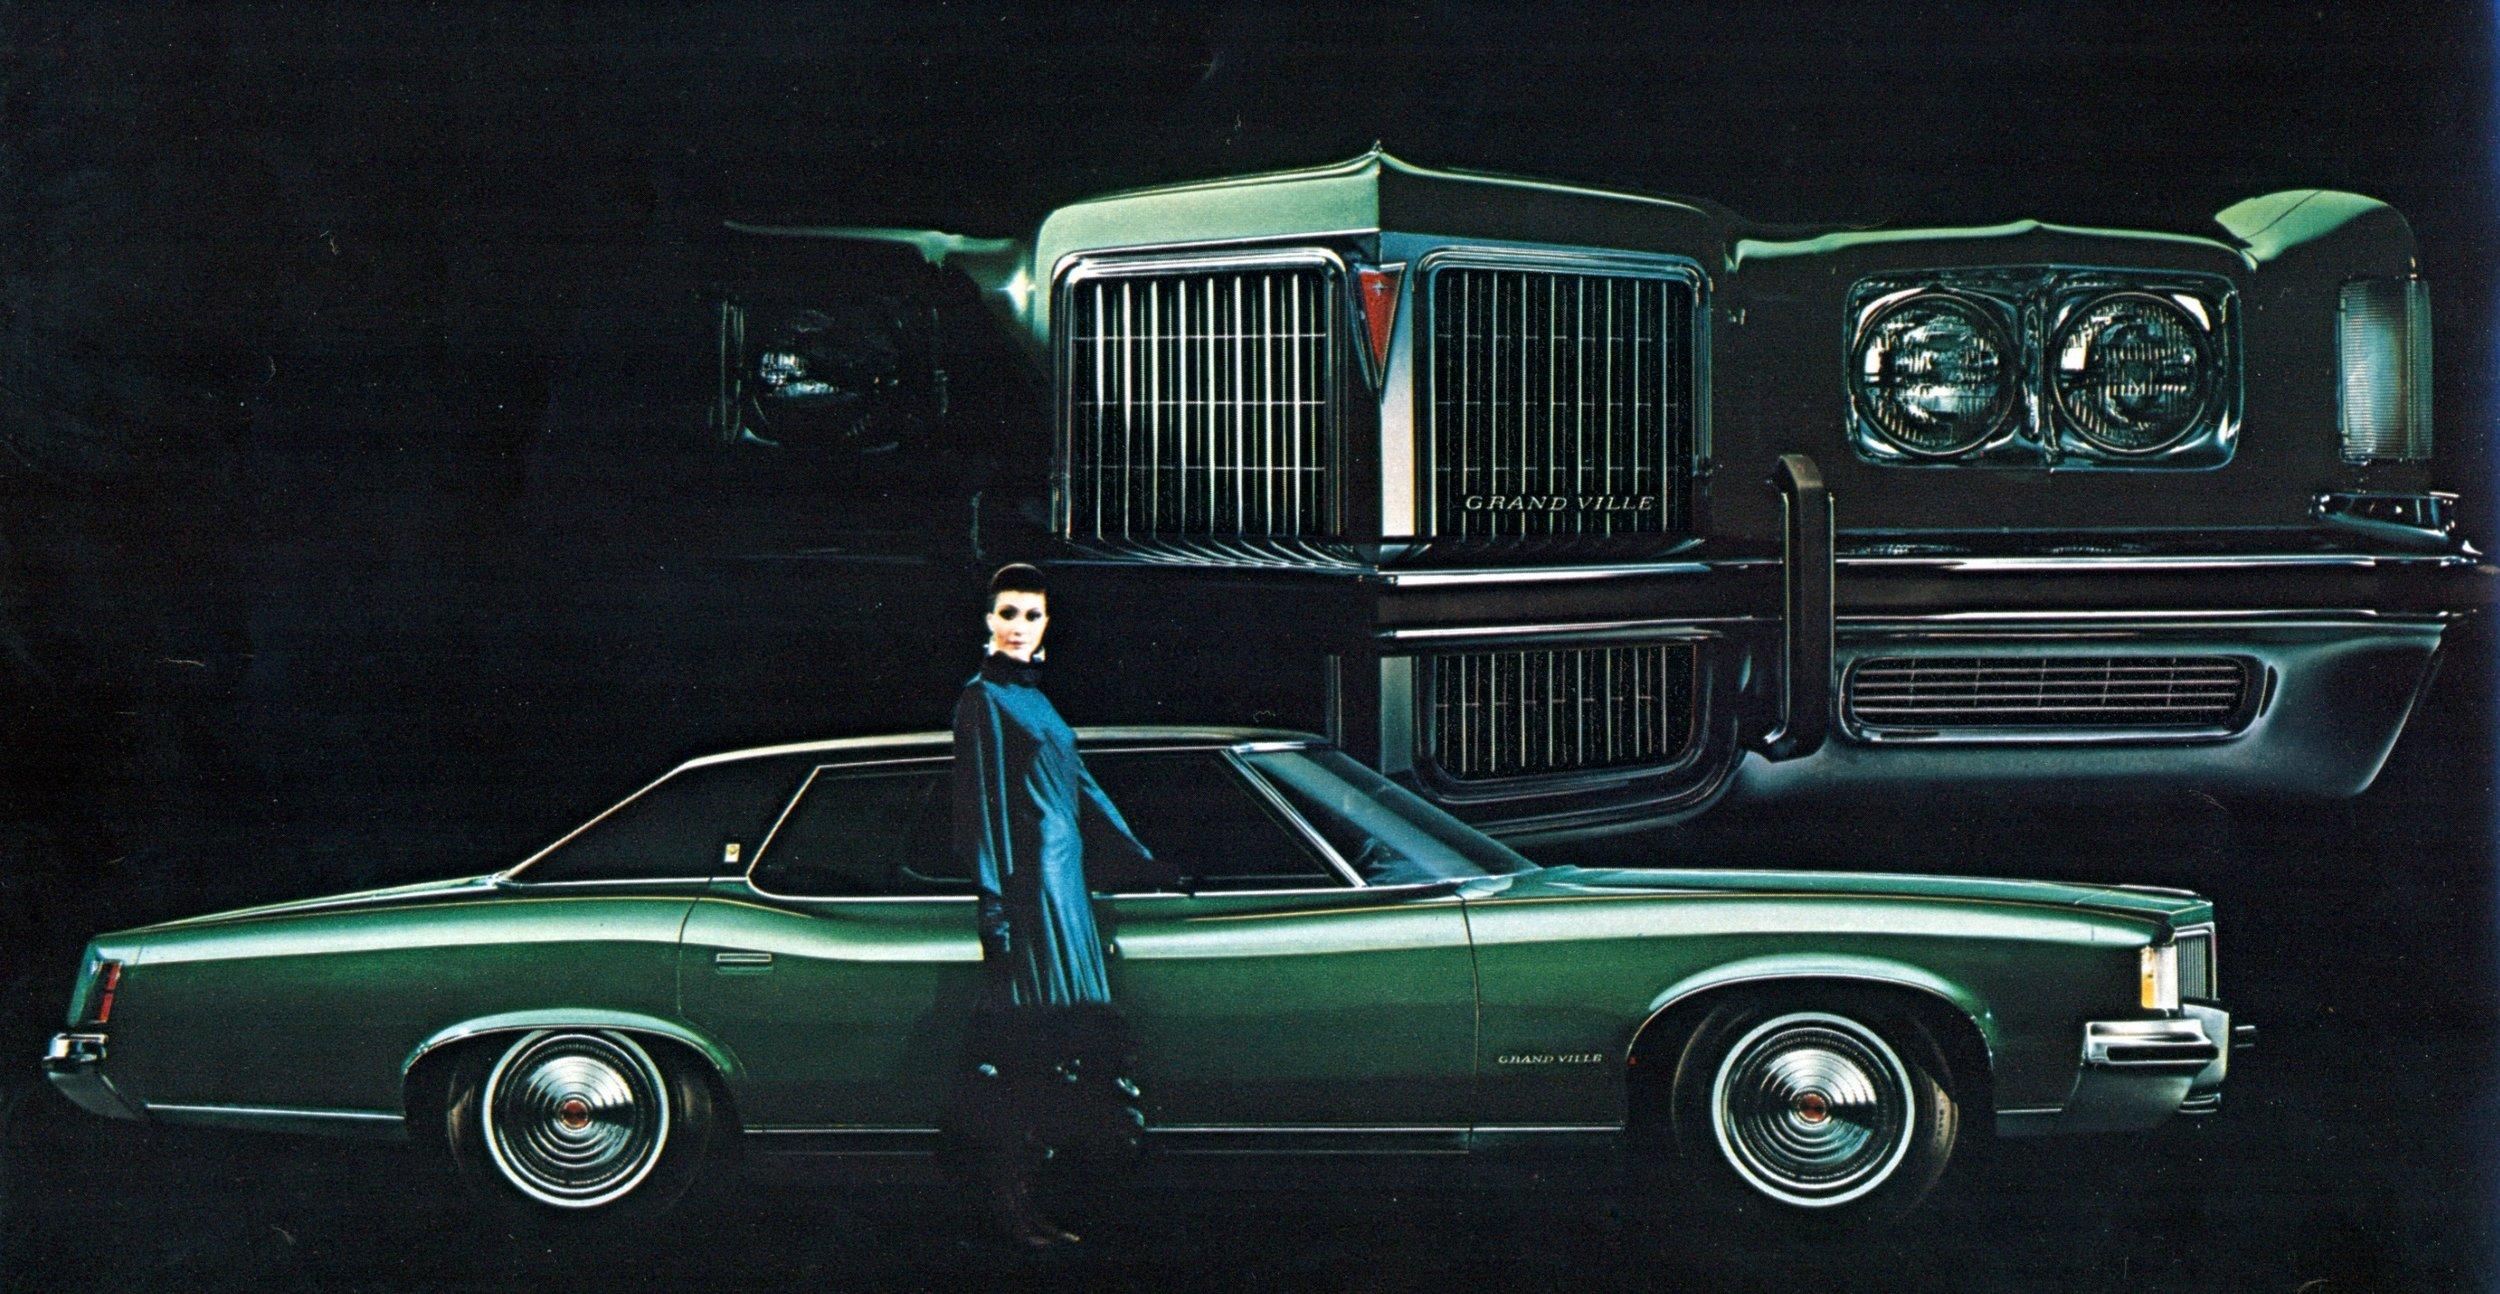 TunnelRam_Pontiac (61).jpeg